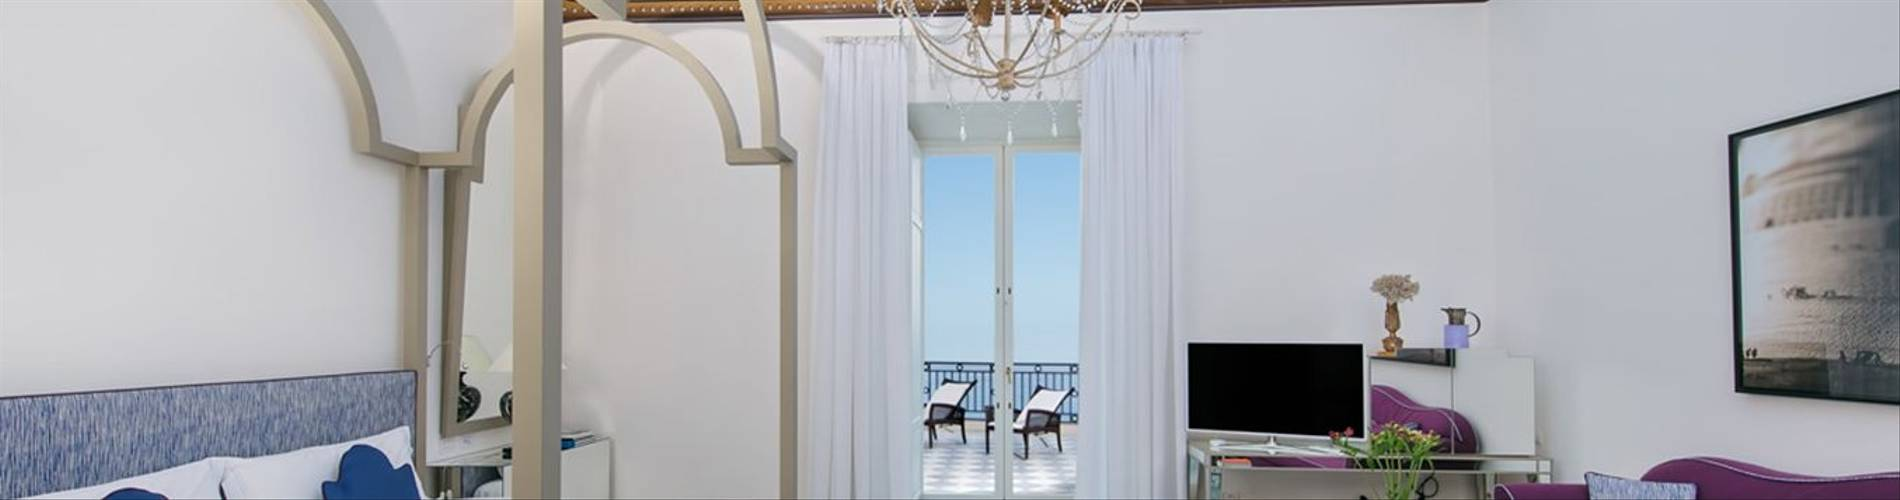 Bellevue Syrene, Sorrento, Italy, Junior Suite (4).jpg